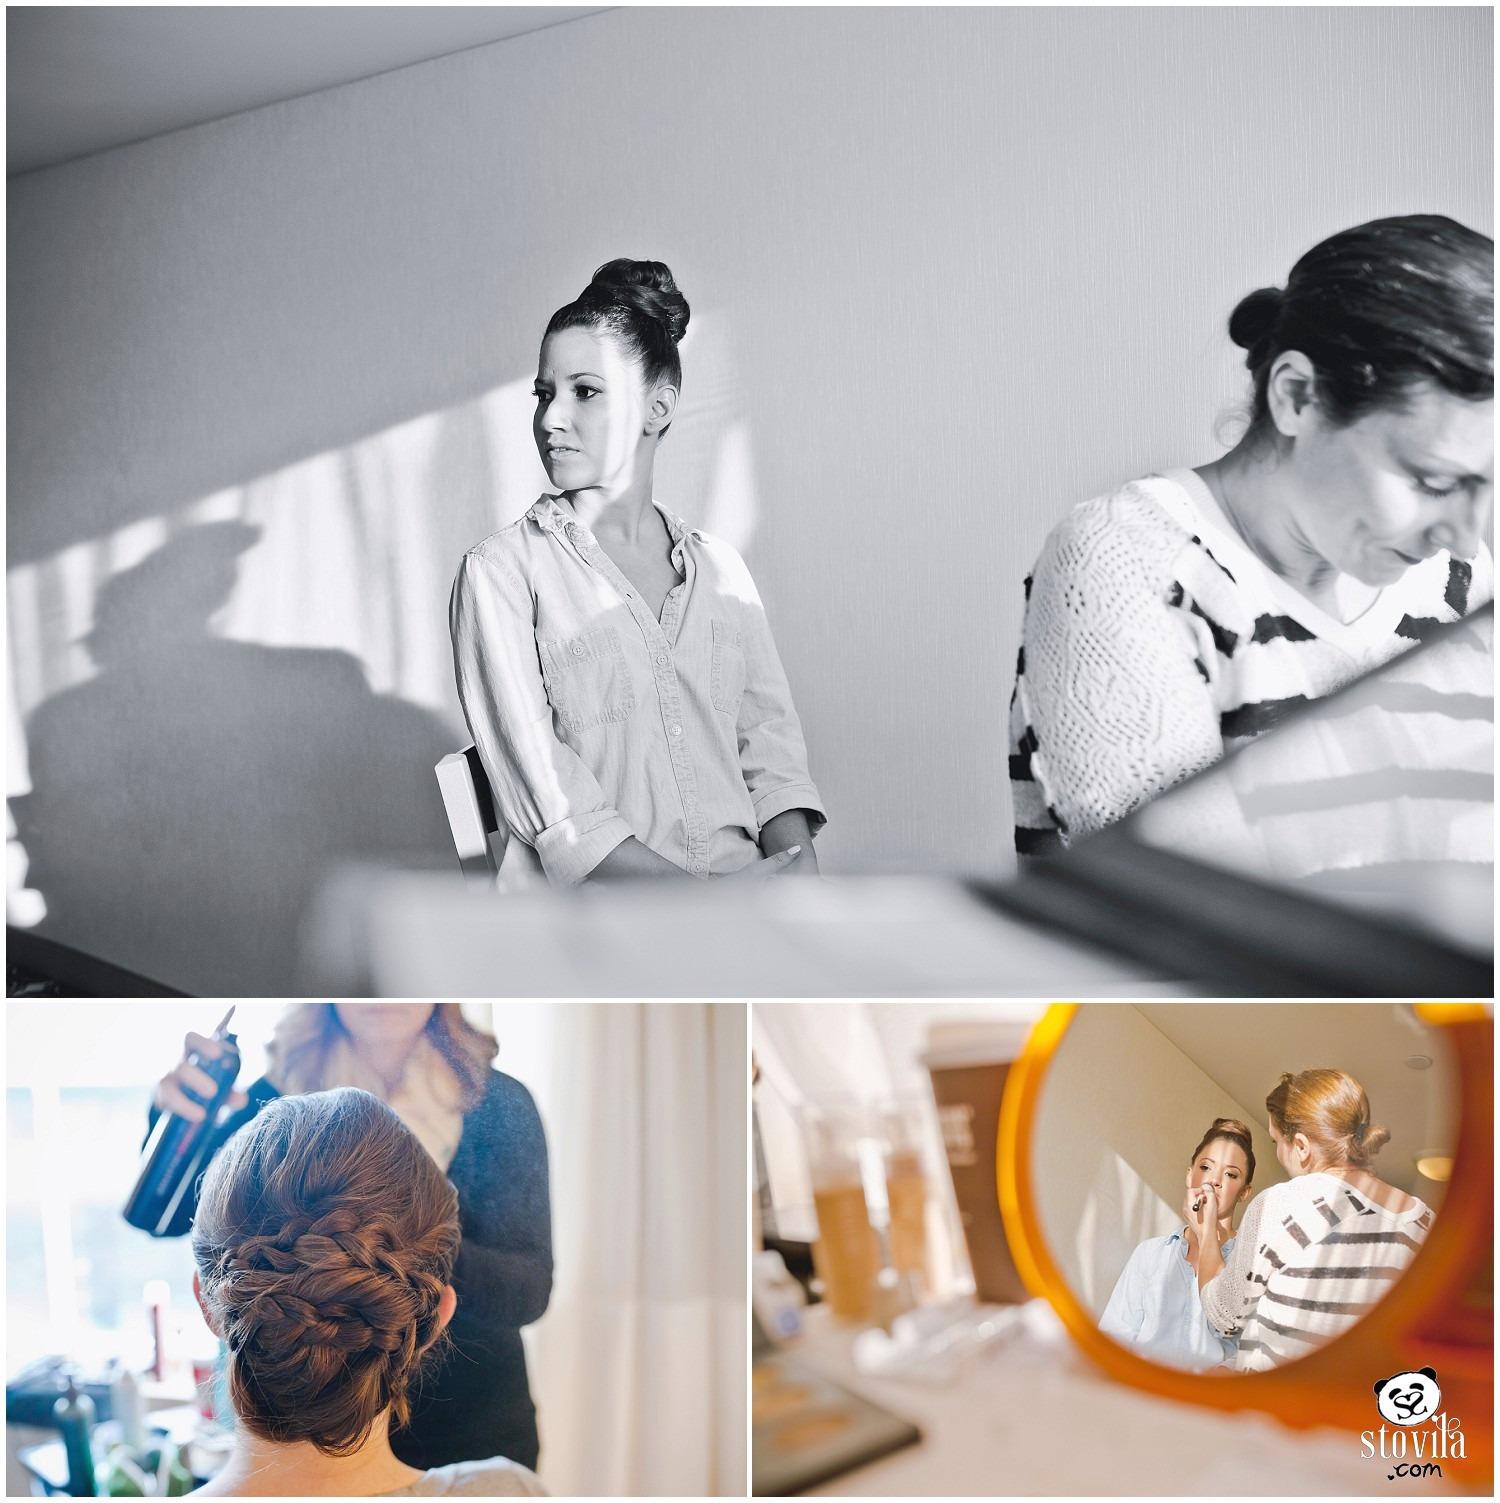 KB_Tirrell Room Wedding, Boston - Gate of Heaven Church - STOVILA Photography (4)